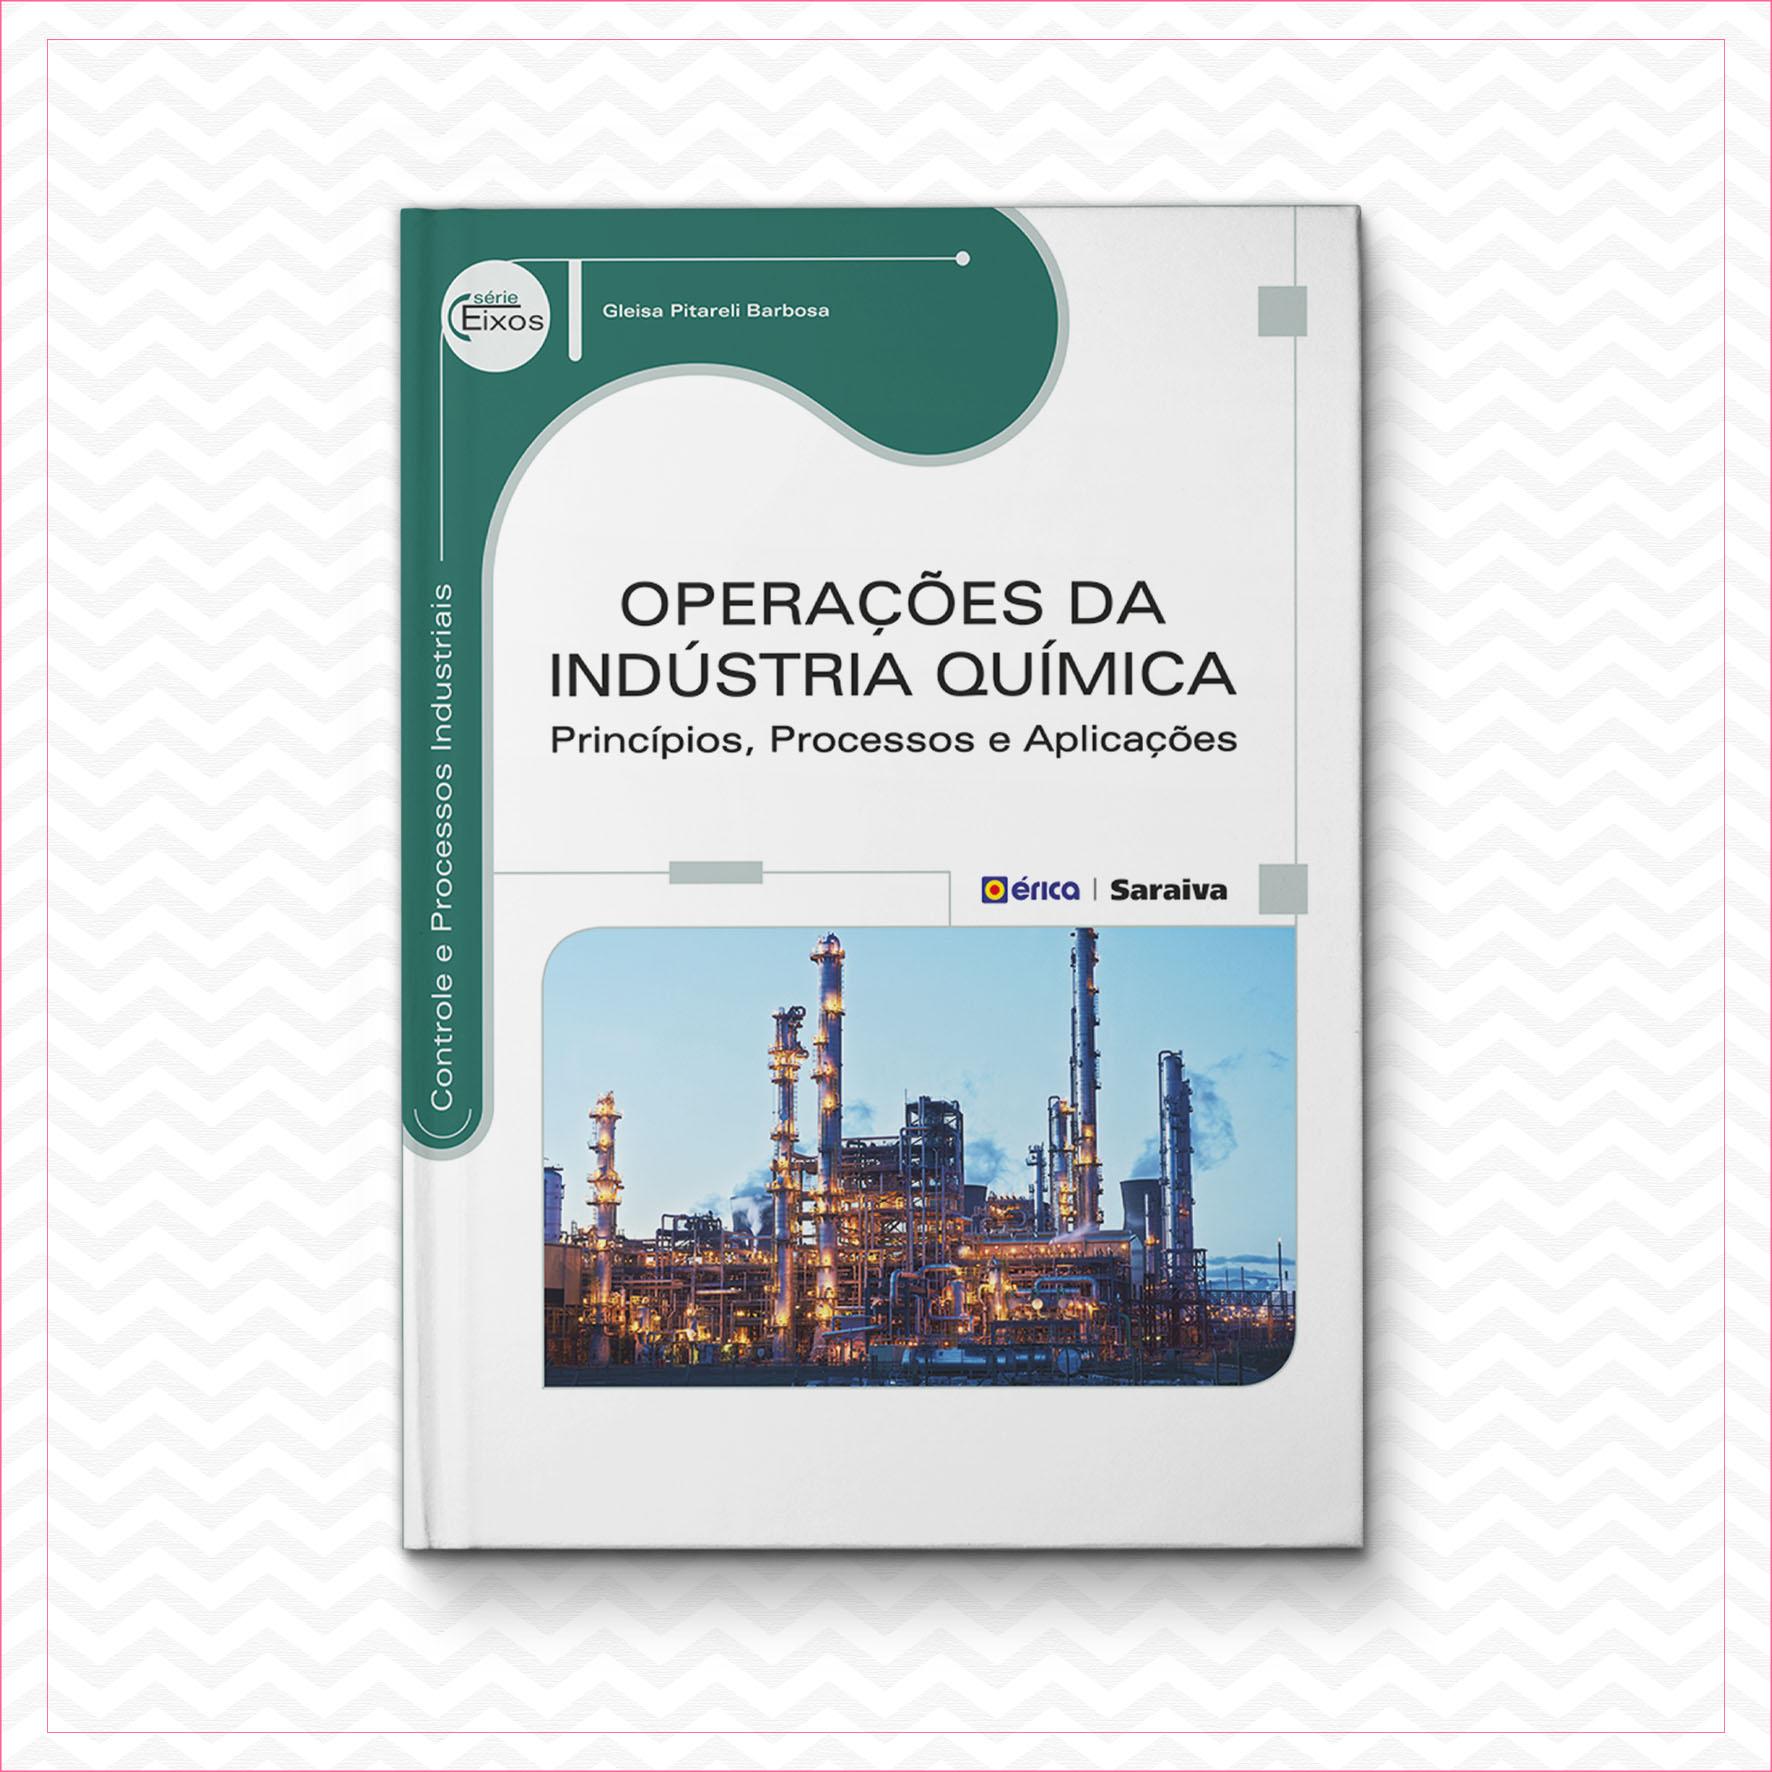 Operações da Indústria Química – Gleisa Pitareli Barbosa